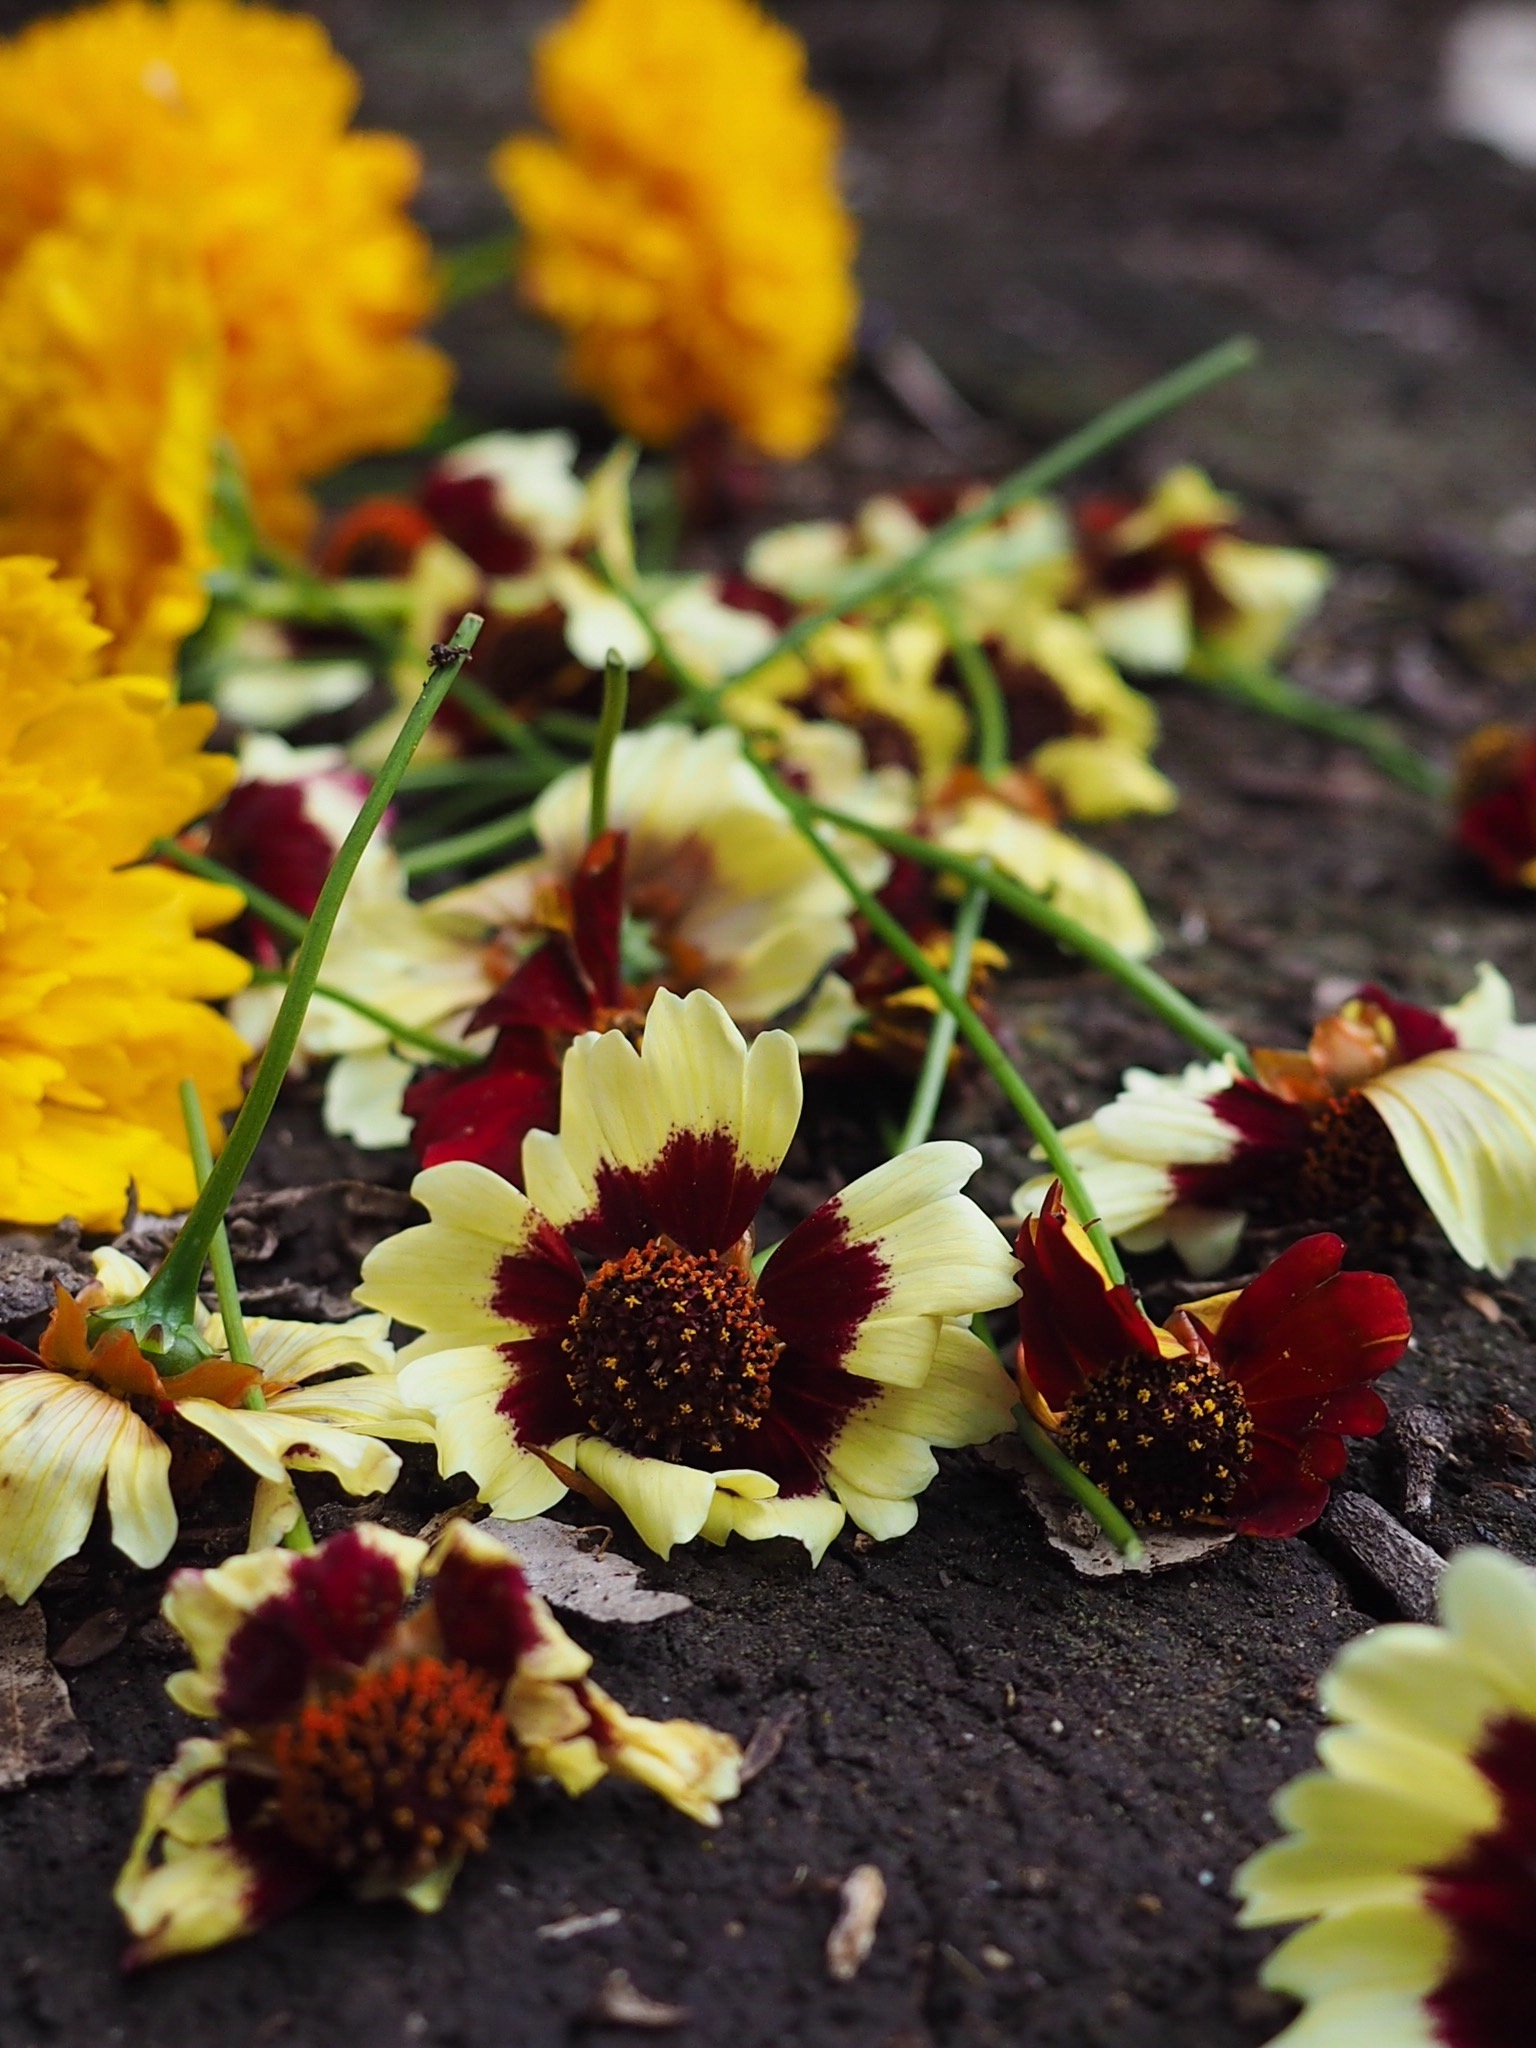 Ellie Beck Petalplum_coreopsis flowers natural dyeing_web size86F867F0-03EC-4961-971B-661CB0F09D68.JPG